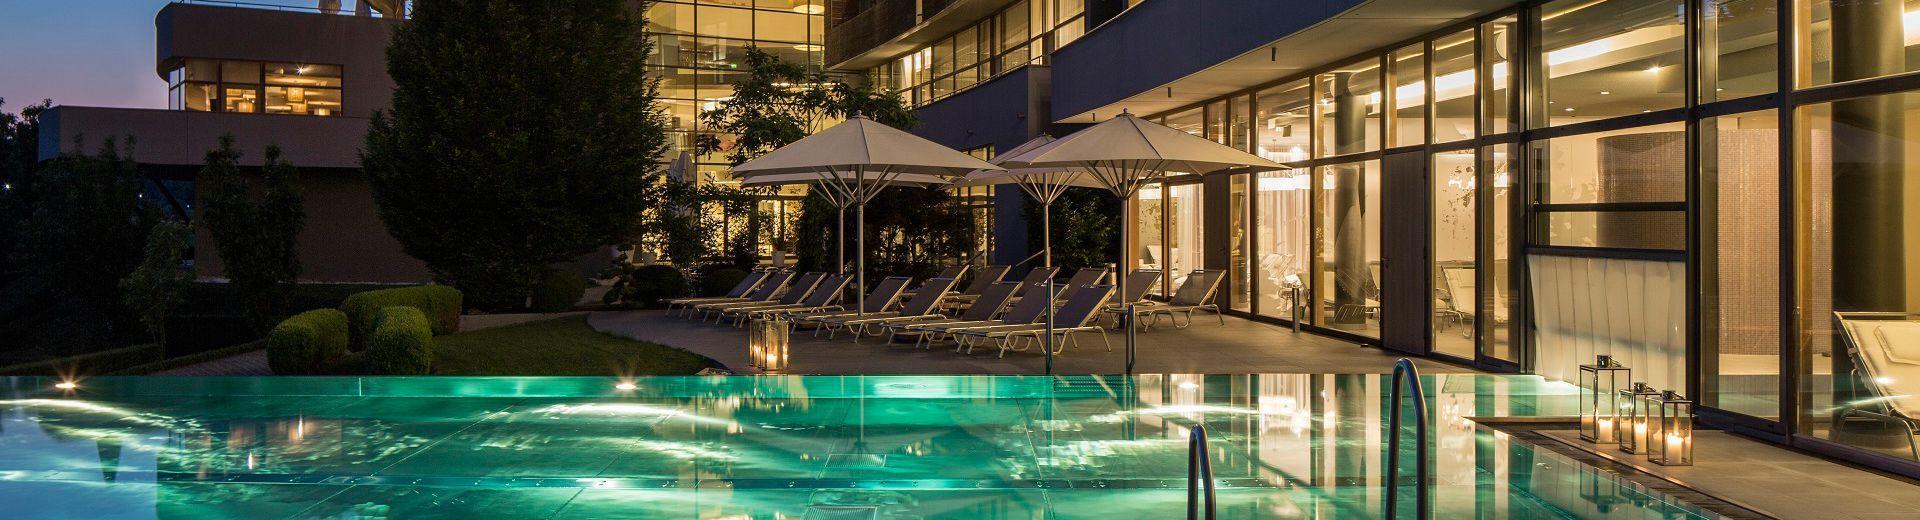 5-Sterne ADULTS ONLY Hotel zum exklusiven Mega-Preis